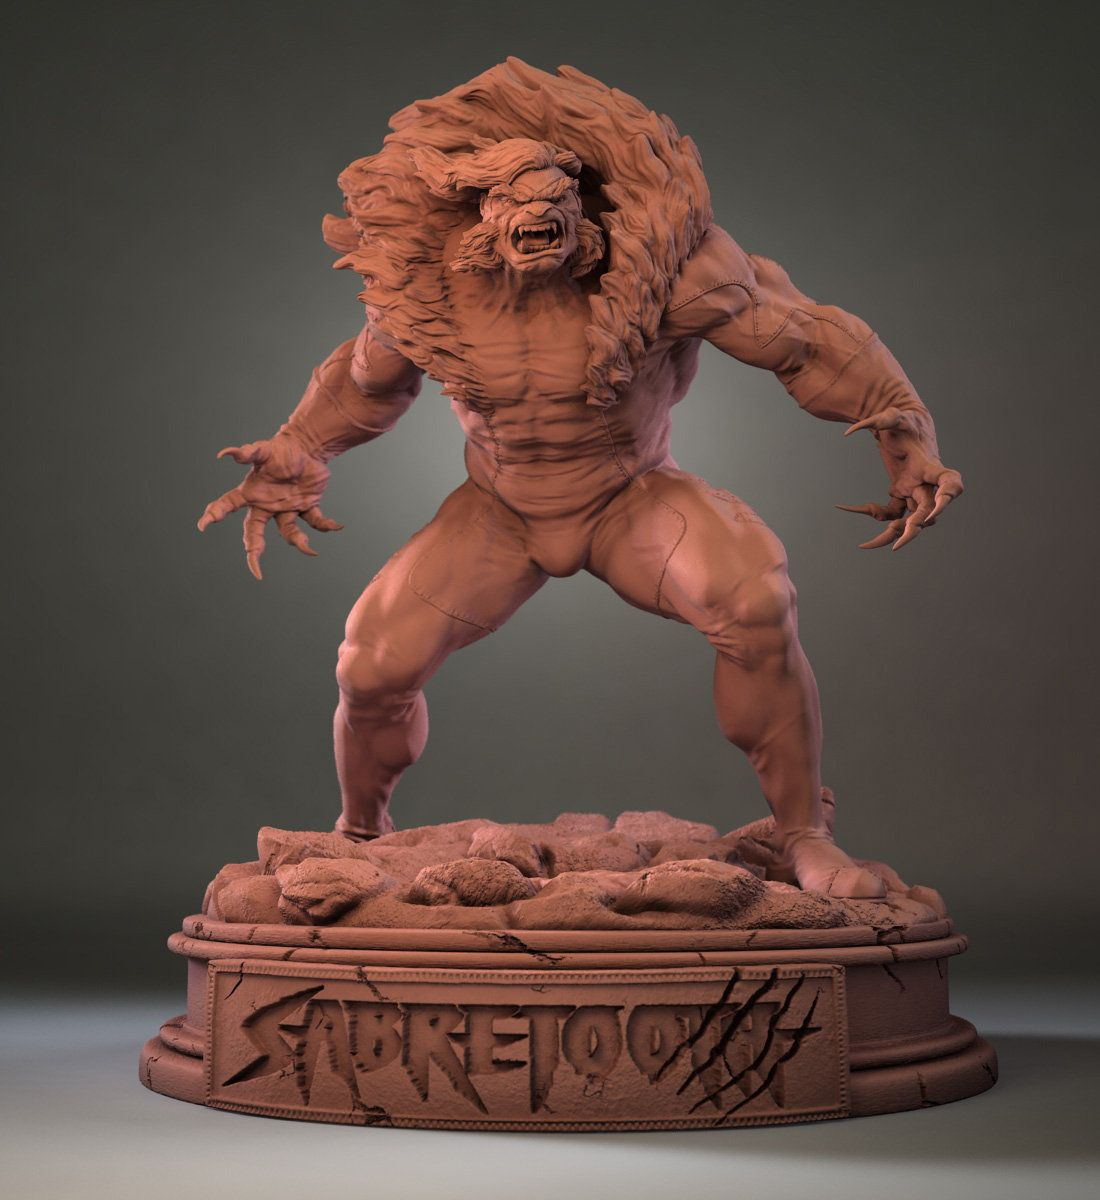 Sabretooth, Jose Pericles on ArtStation at http://www.artstation.com/artwork/sabretooth-4978432a-7da1-4e91-8a72-835f49babab1